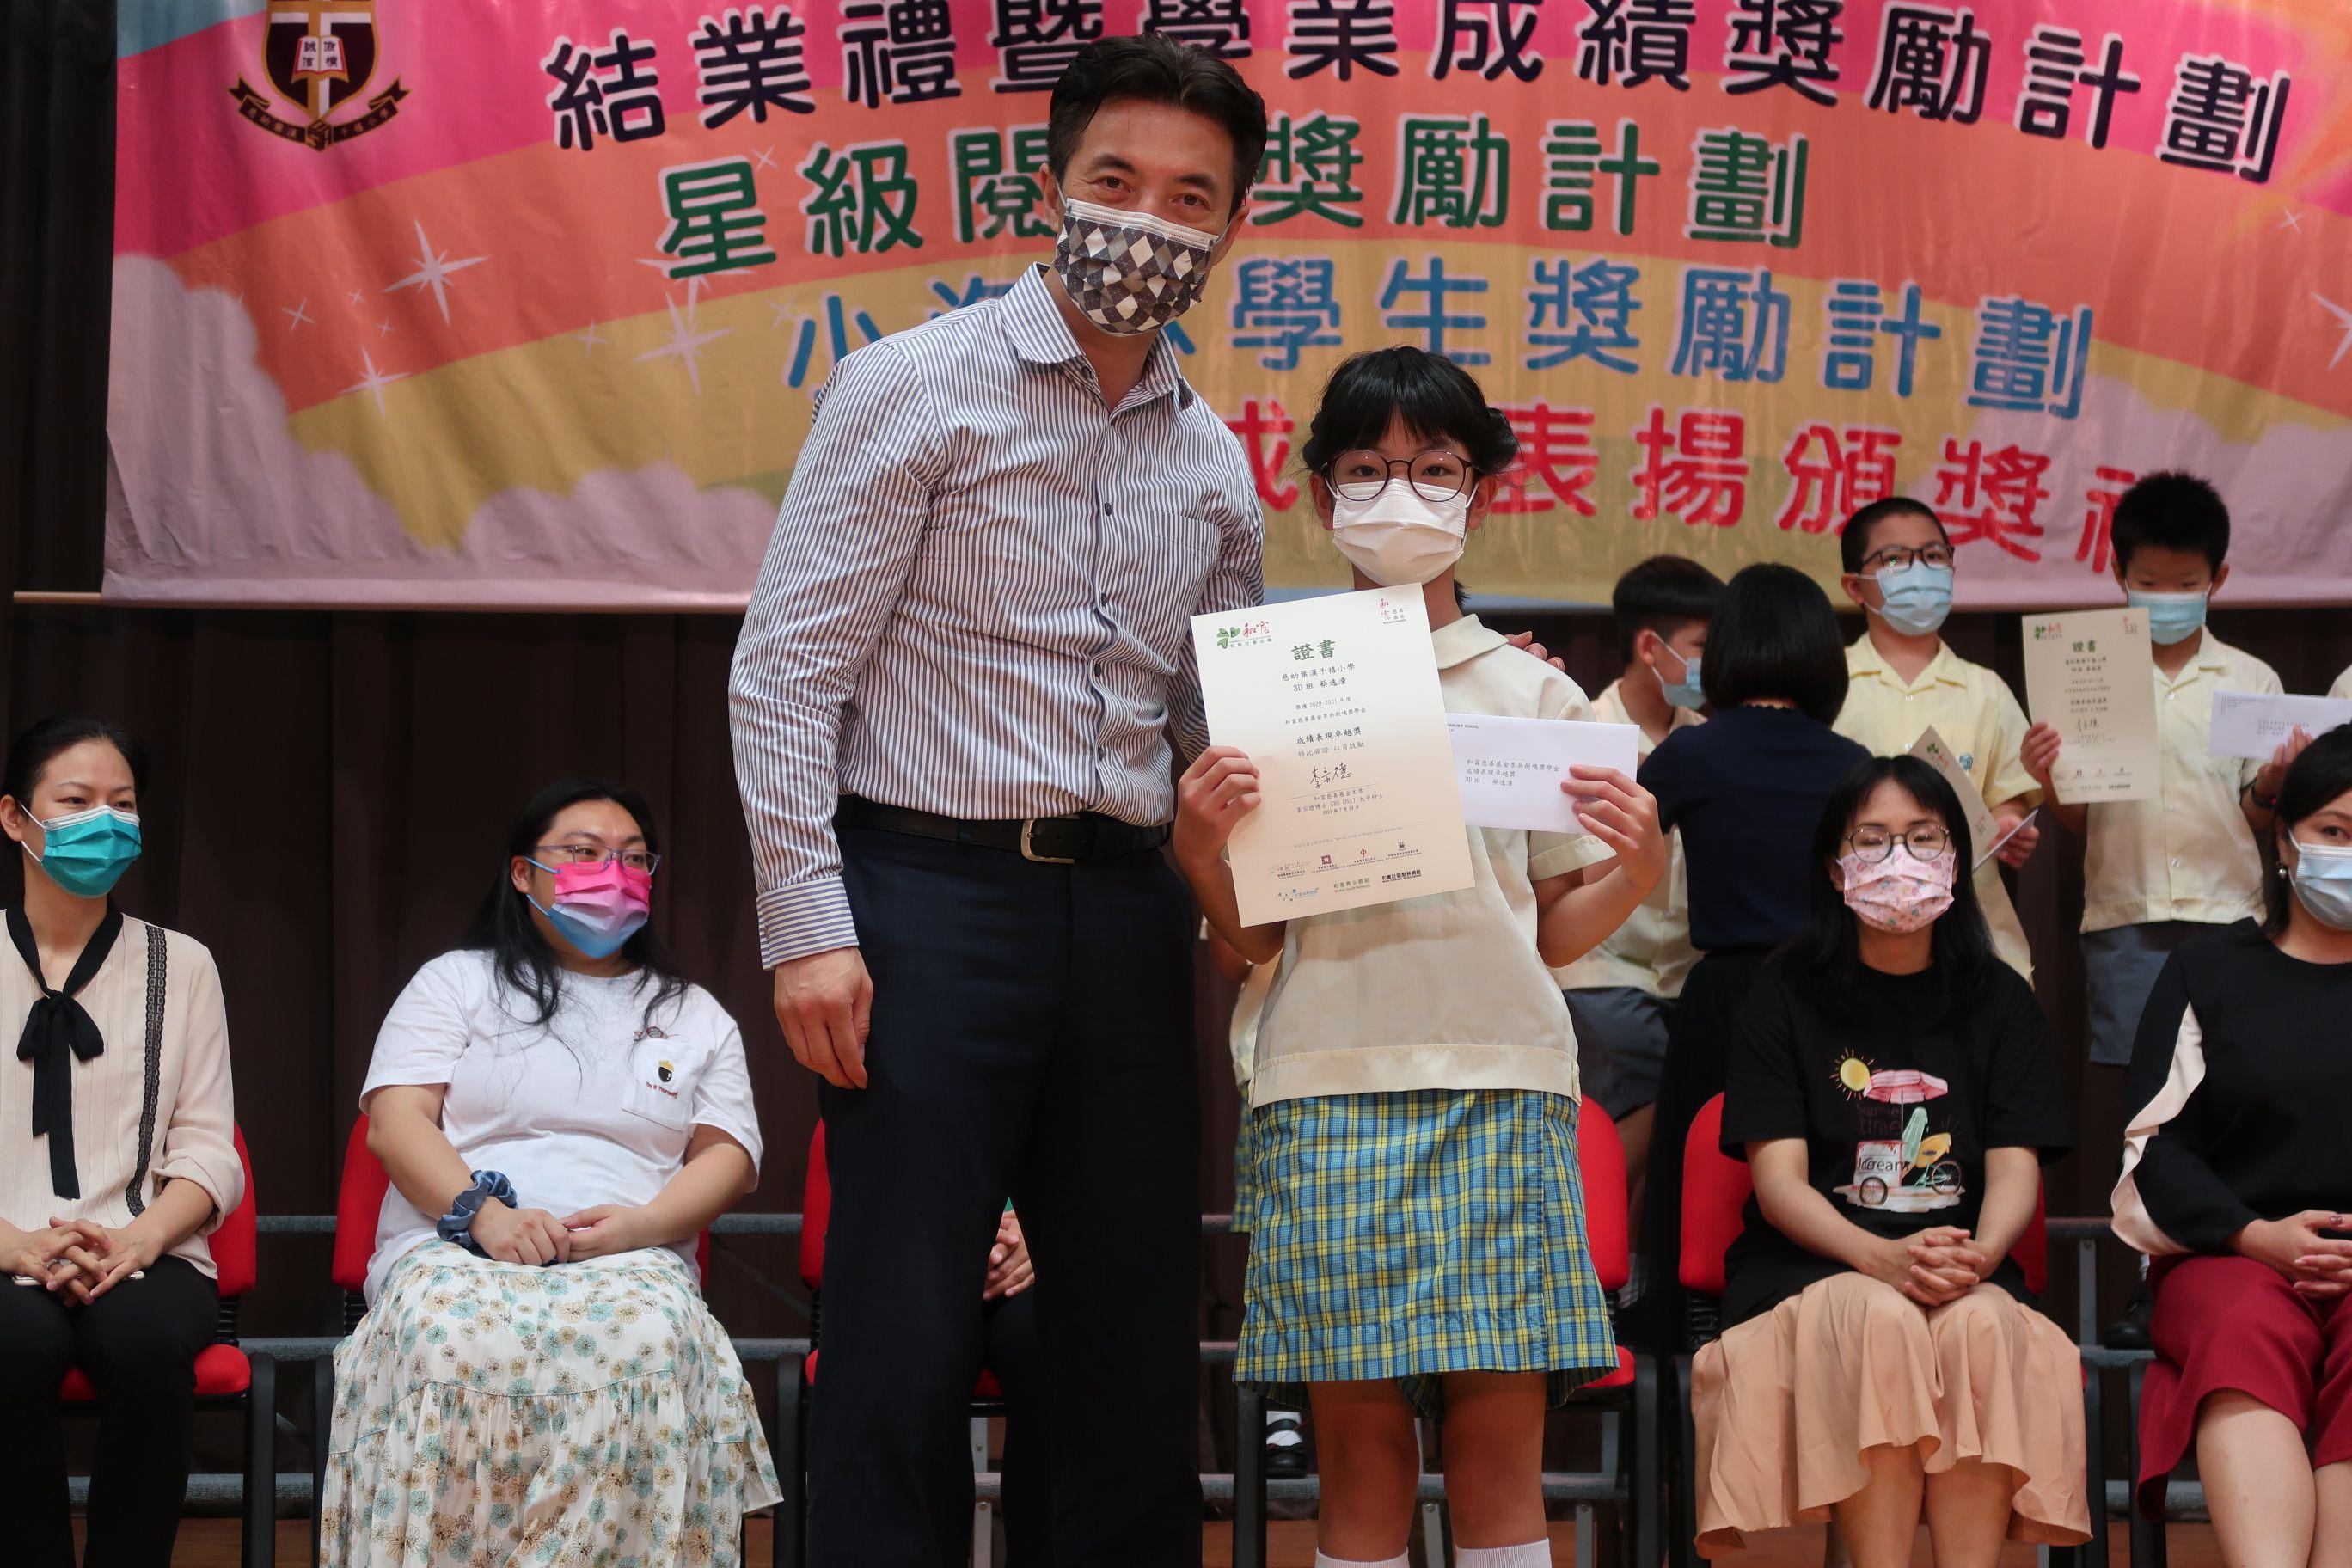 https://syh.edu.hk/sites/default/files/img_5934.jpg